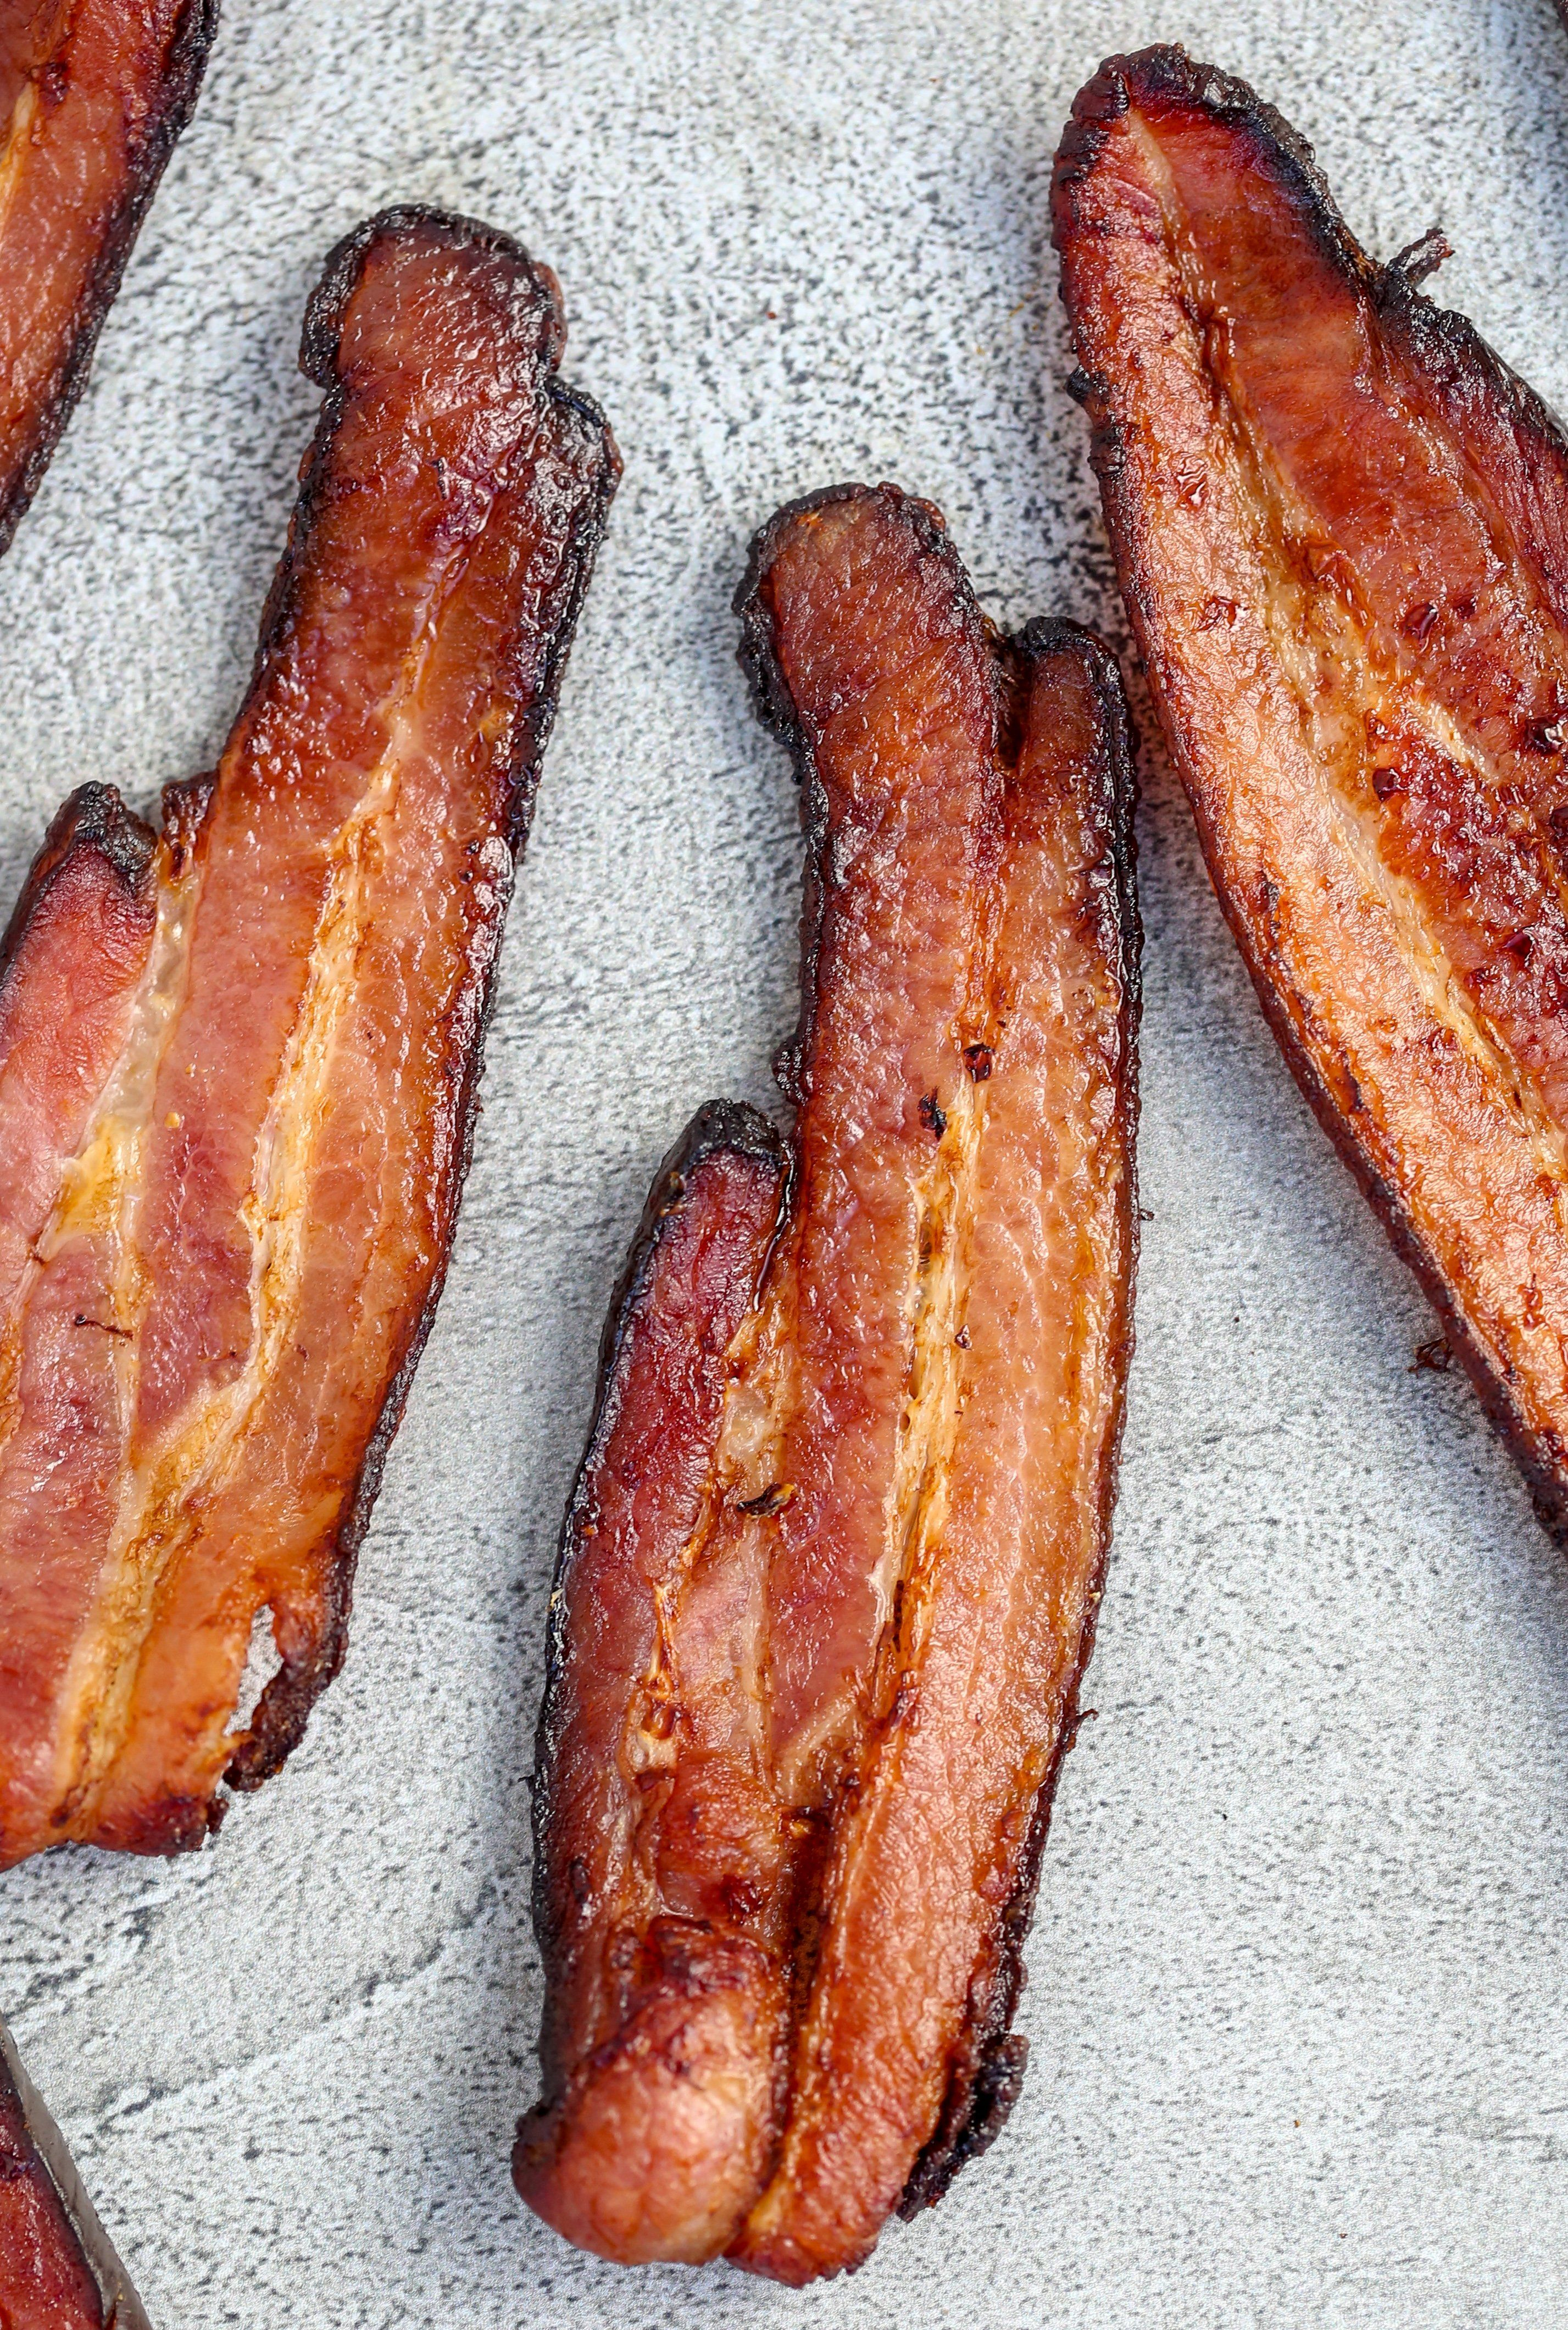 Air Fryer Bacon (Perfectly Crispy) in 2020 Air fryer